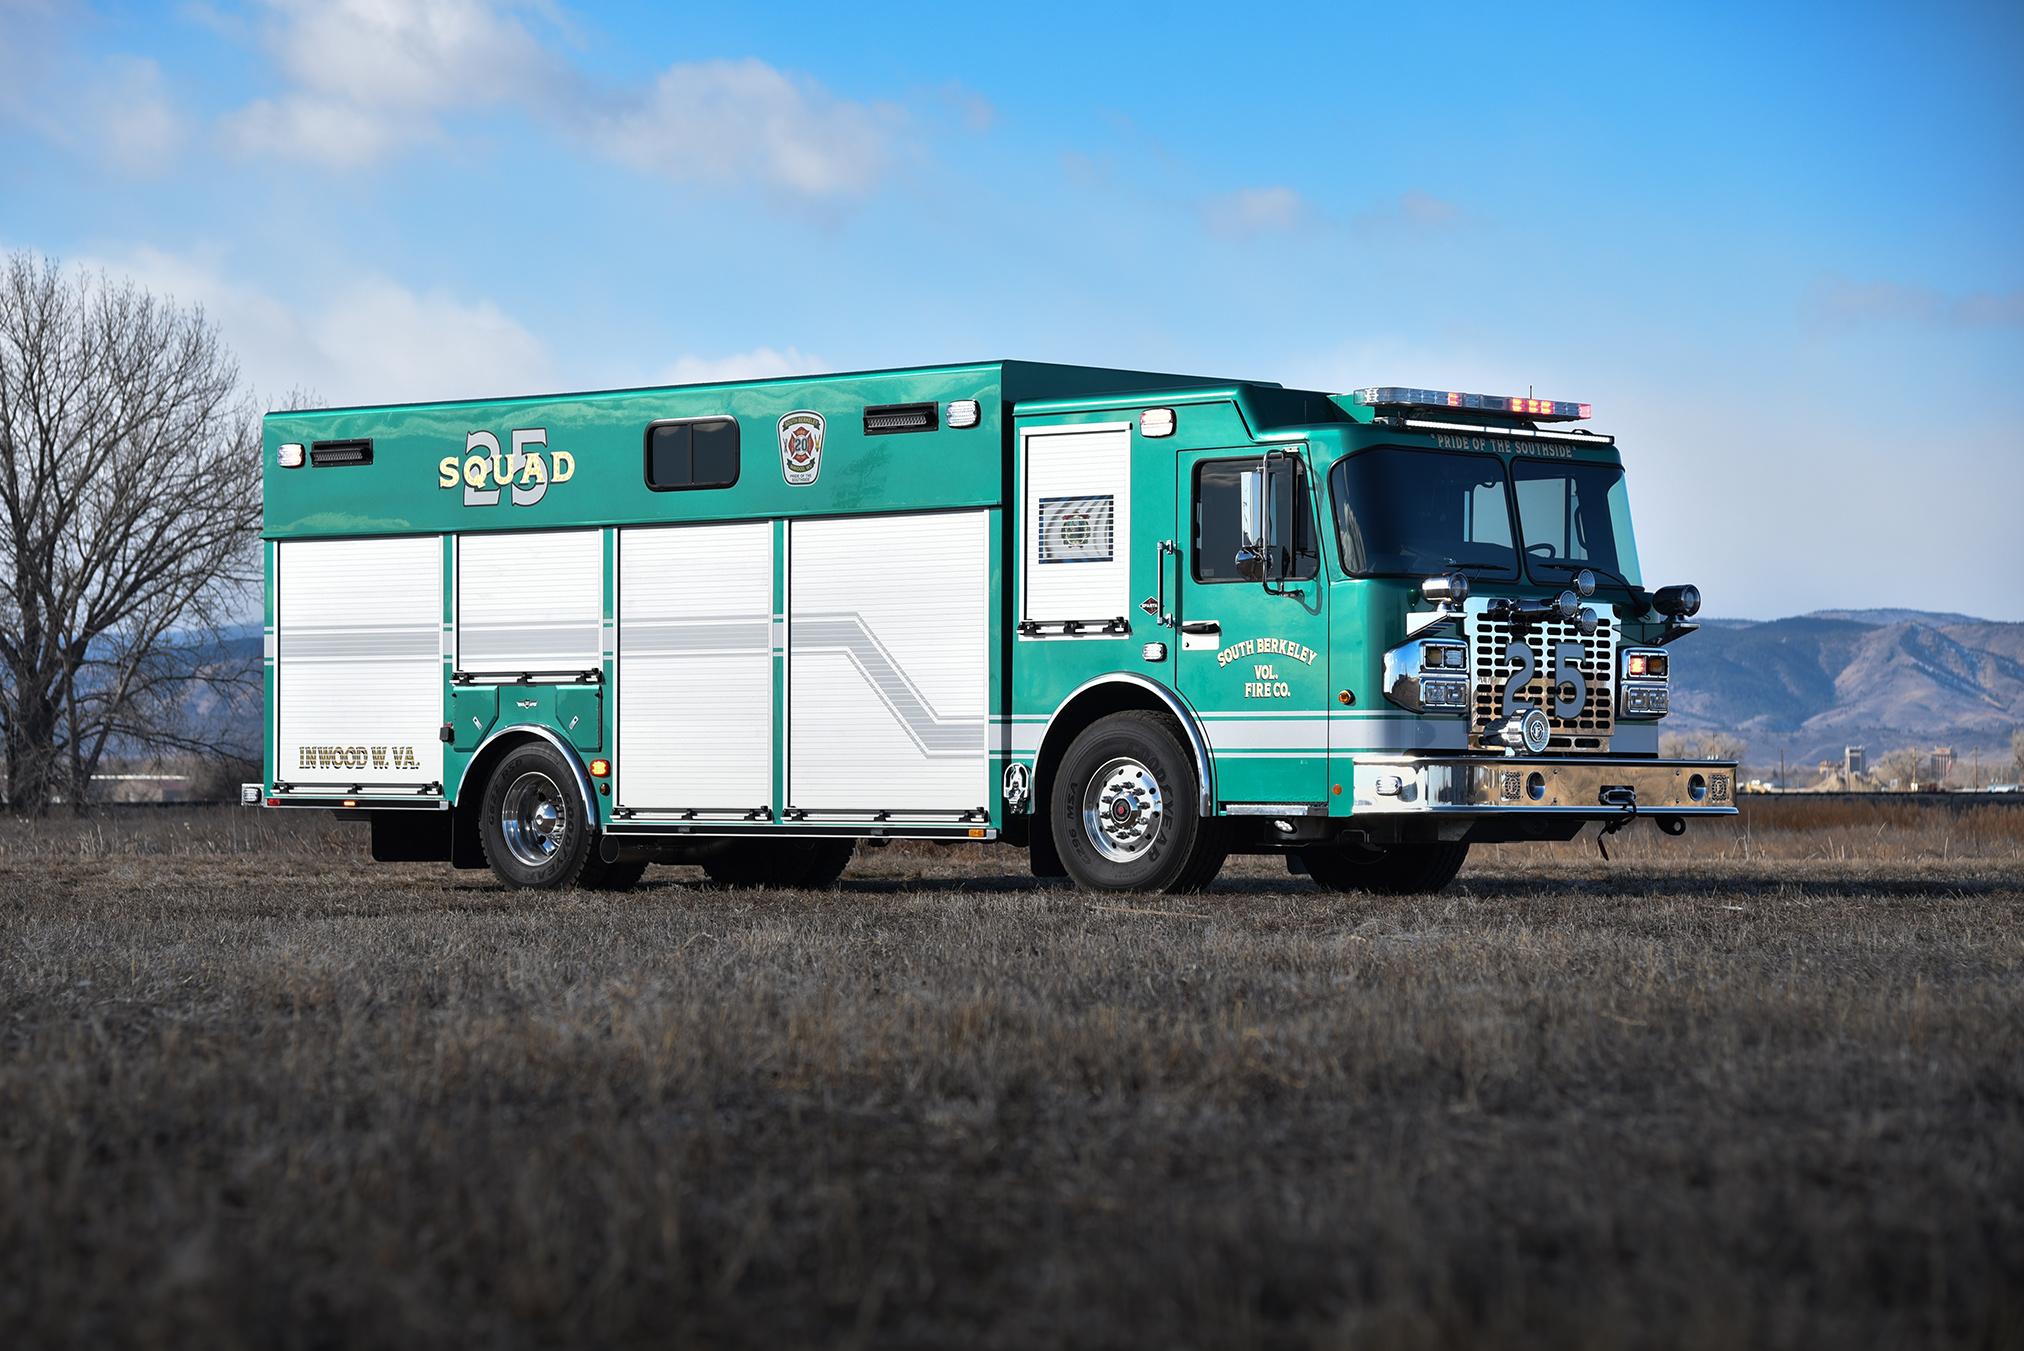 South Berkeley, WV FD #1049 - SVI Trucks